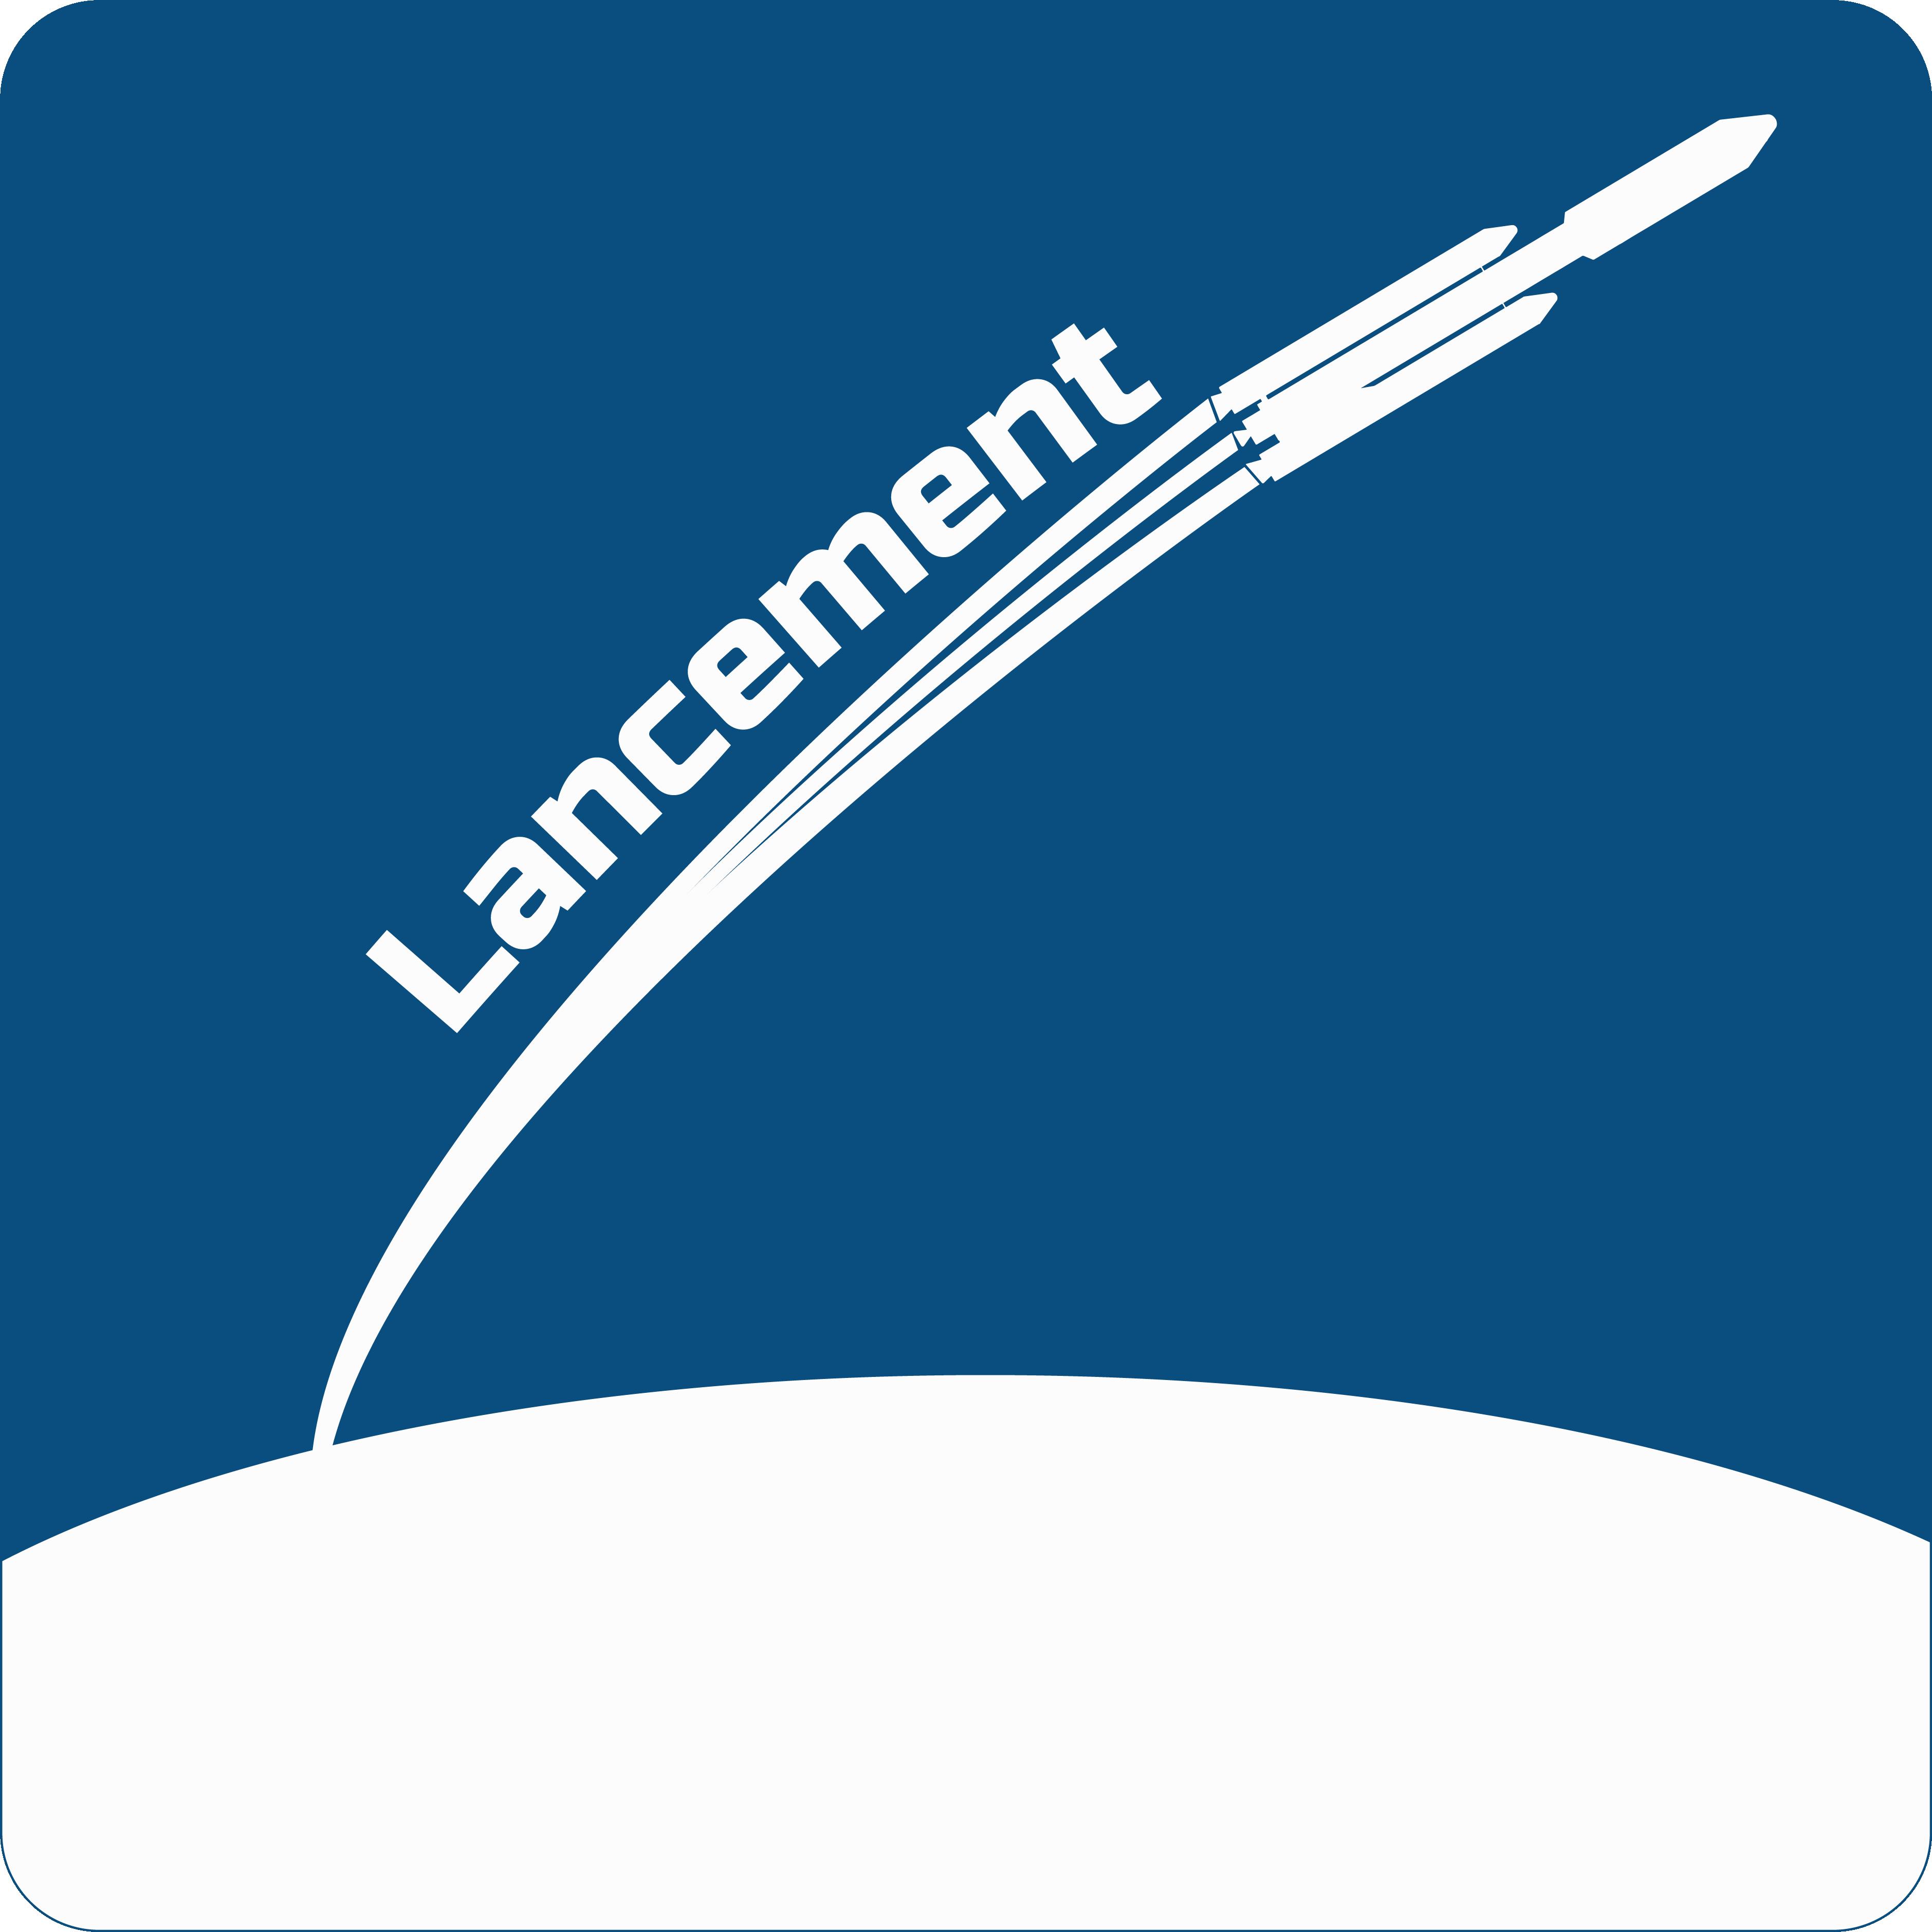 Lancement Vignette Challenge